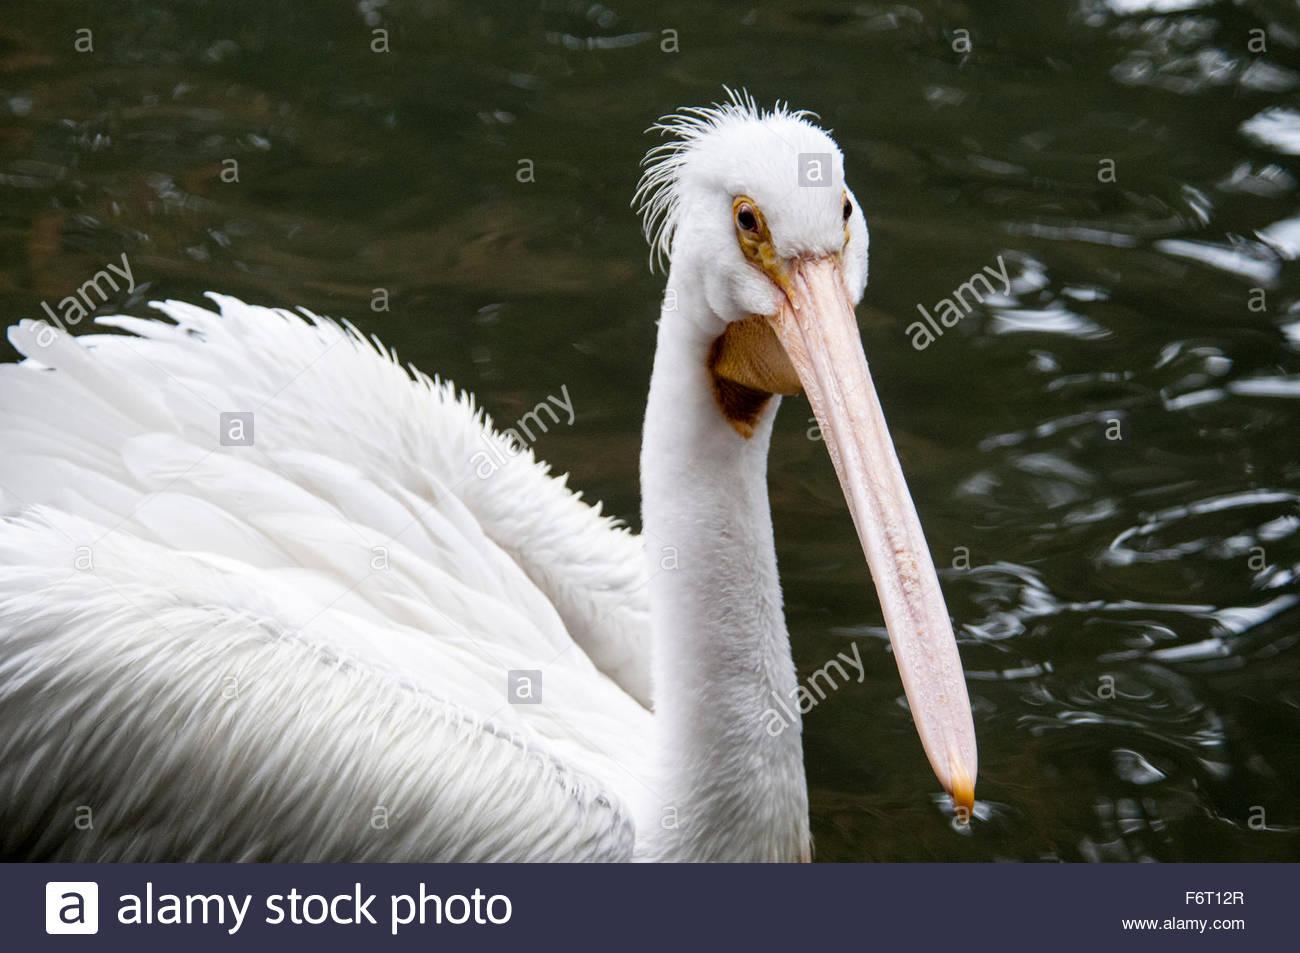 Close up of an American White Pelican, Pelecanus erythrorgnchos, Bronx Zoo, New York, NY, USA Stock Photo